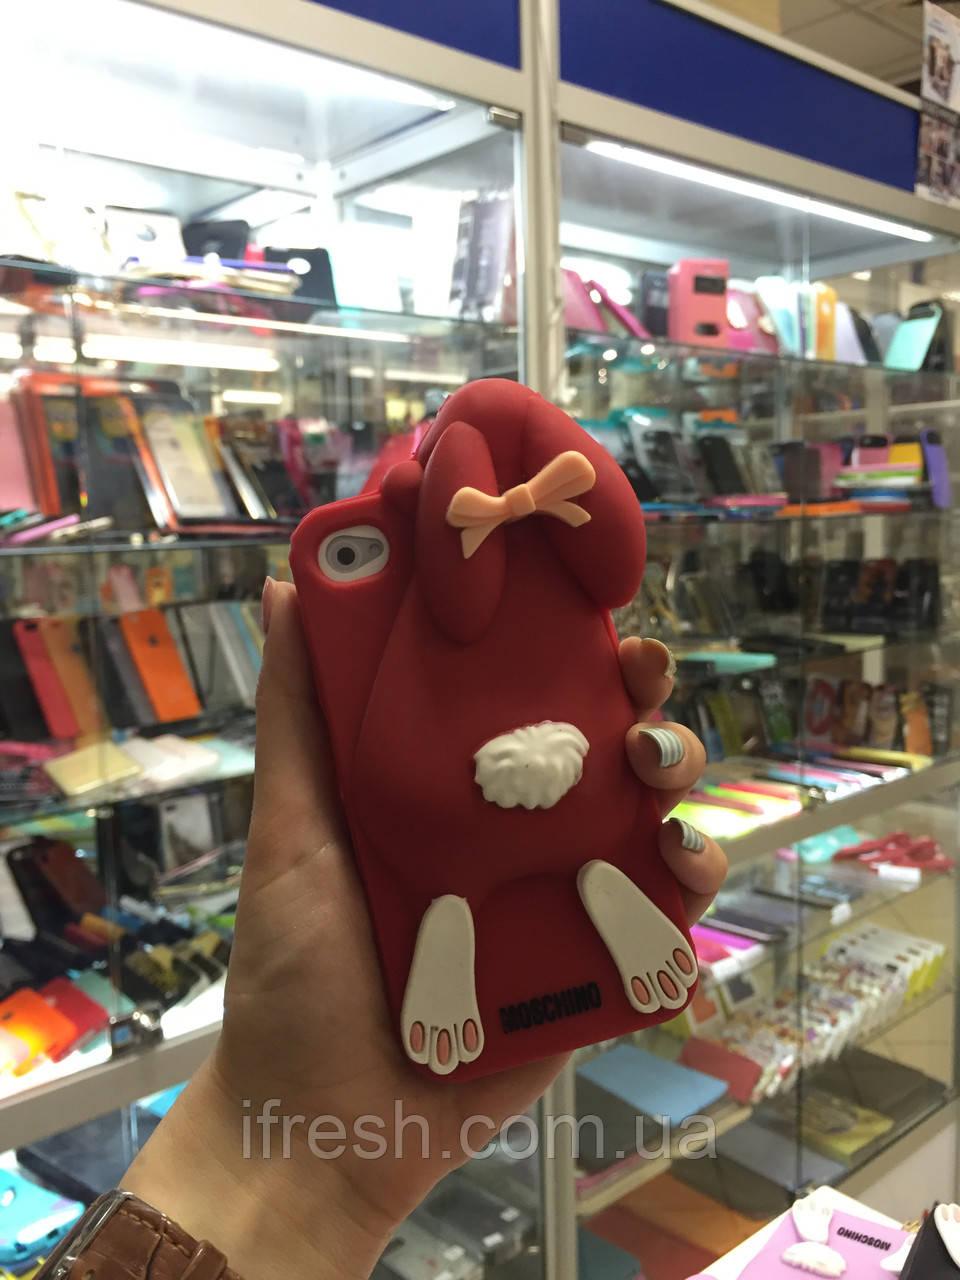 Чехол заяц Moschino для iPhone 5/5S, красный